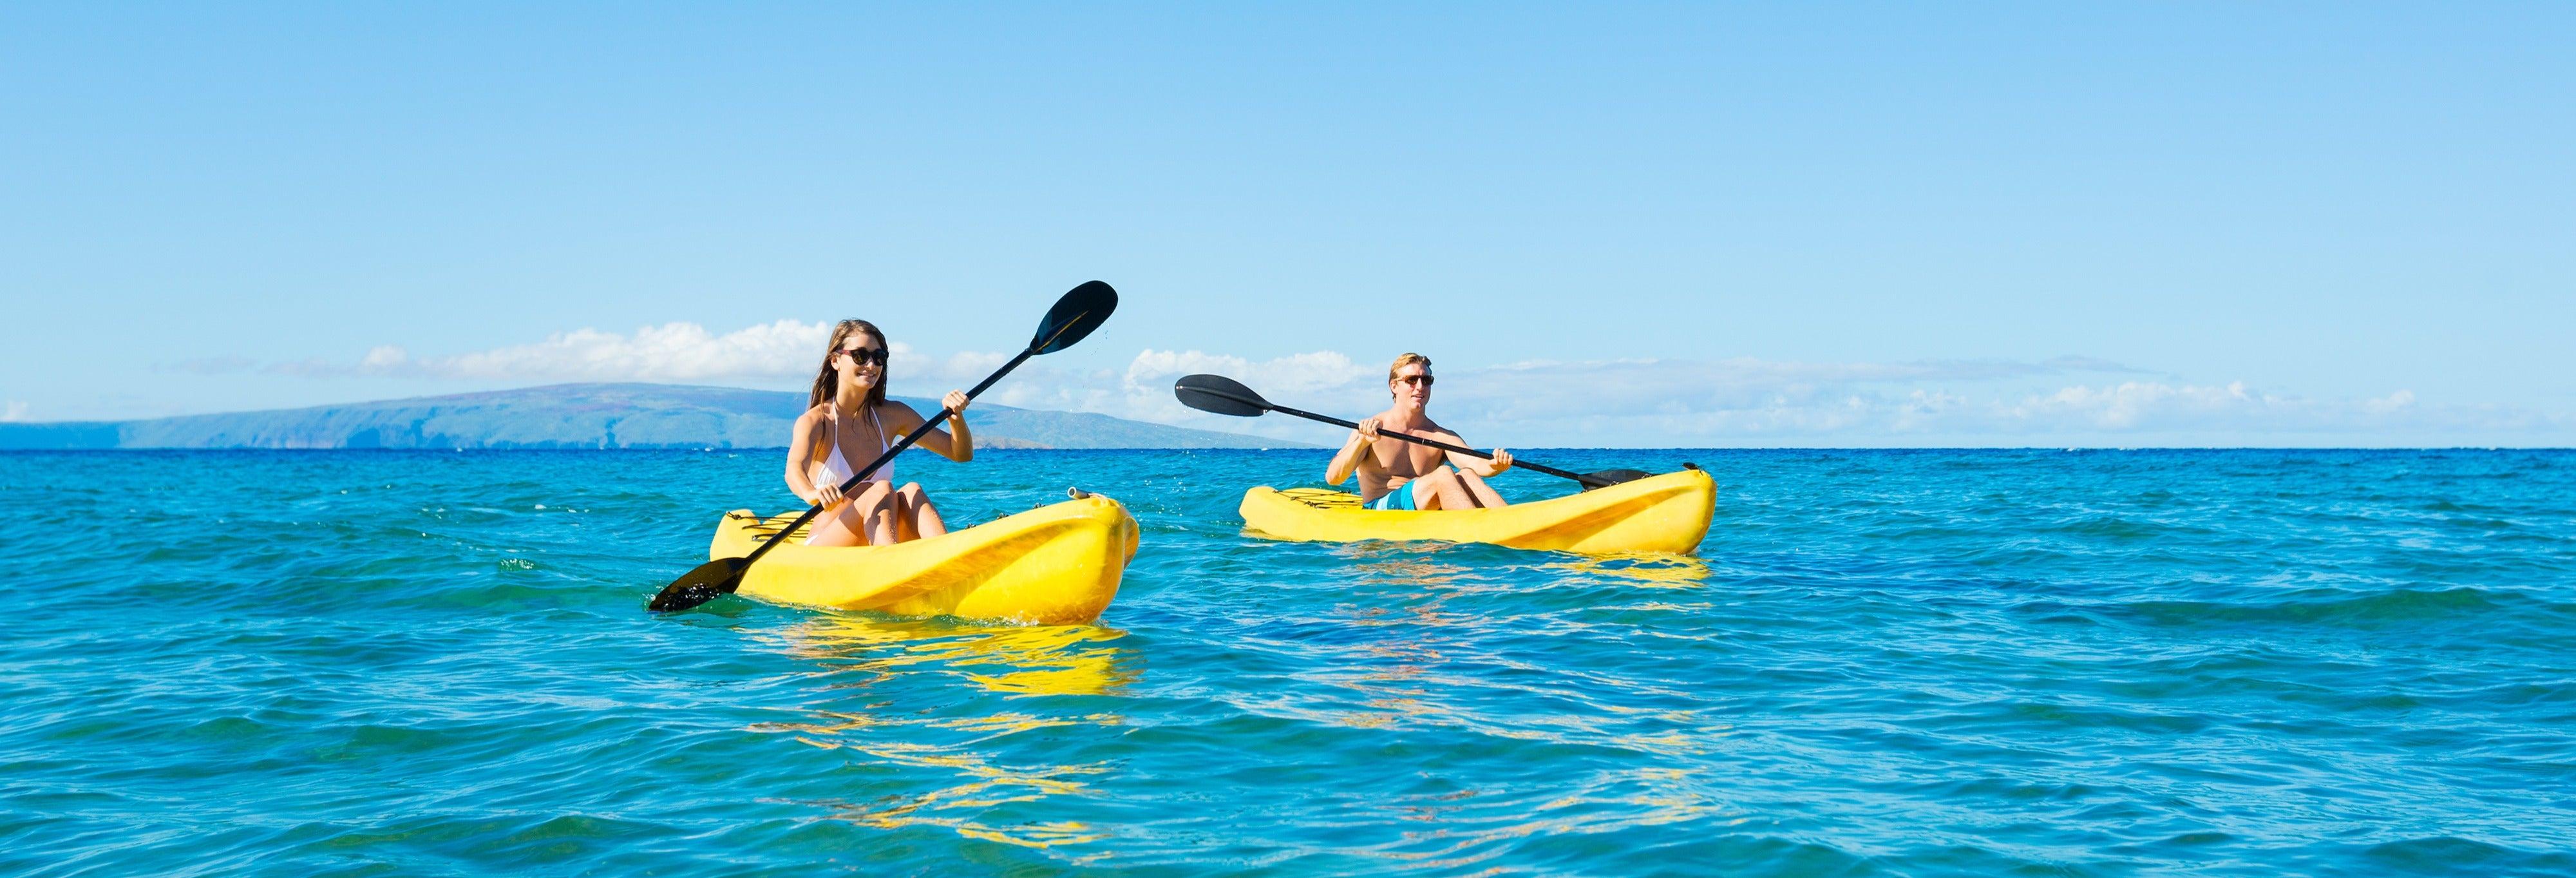 Tour in kayak e snorkeling a Portobelo